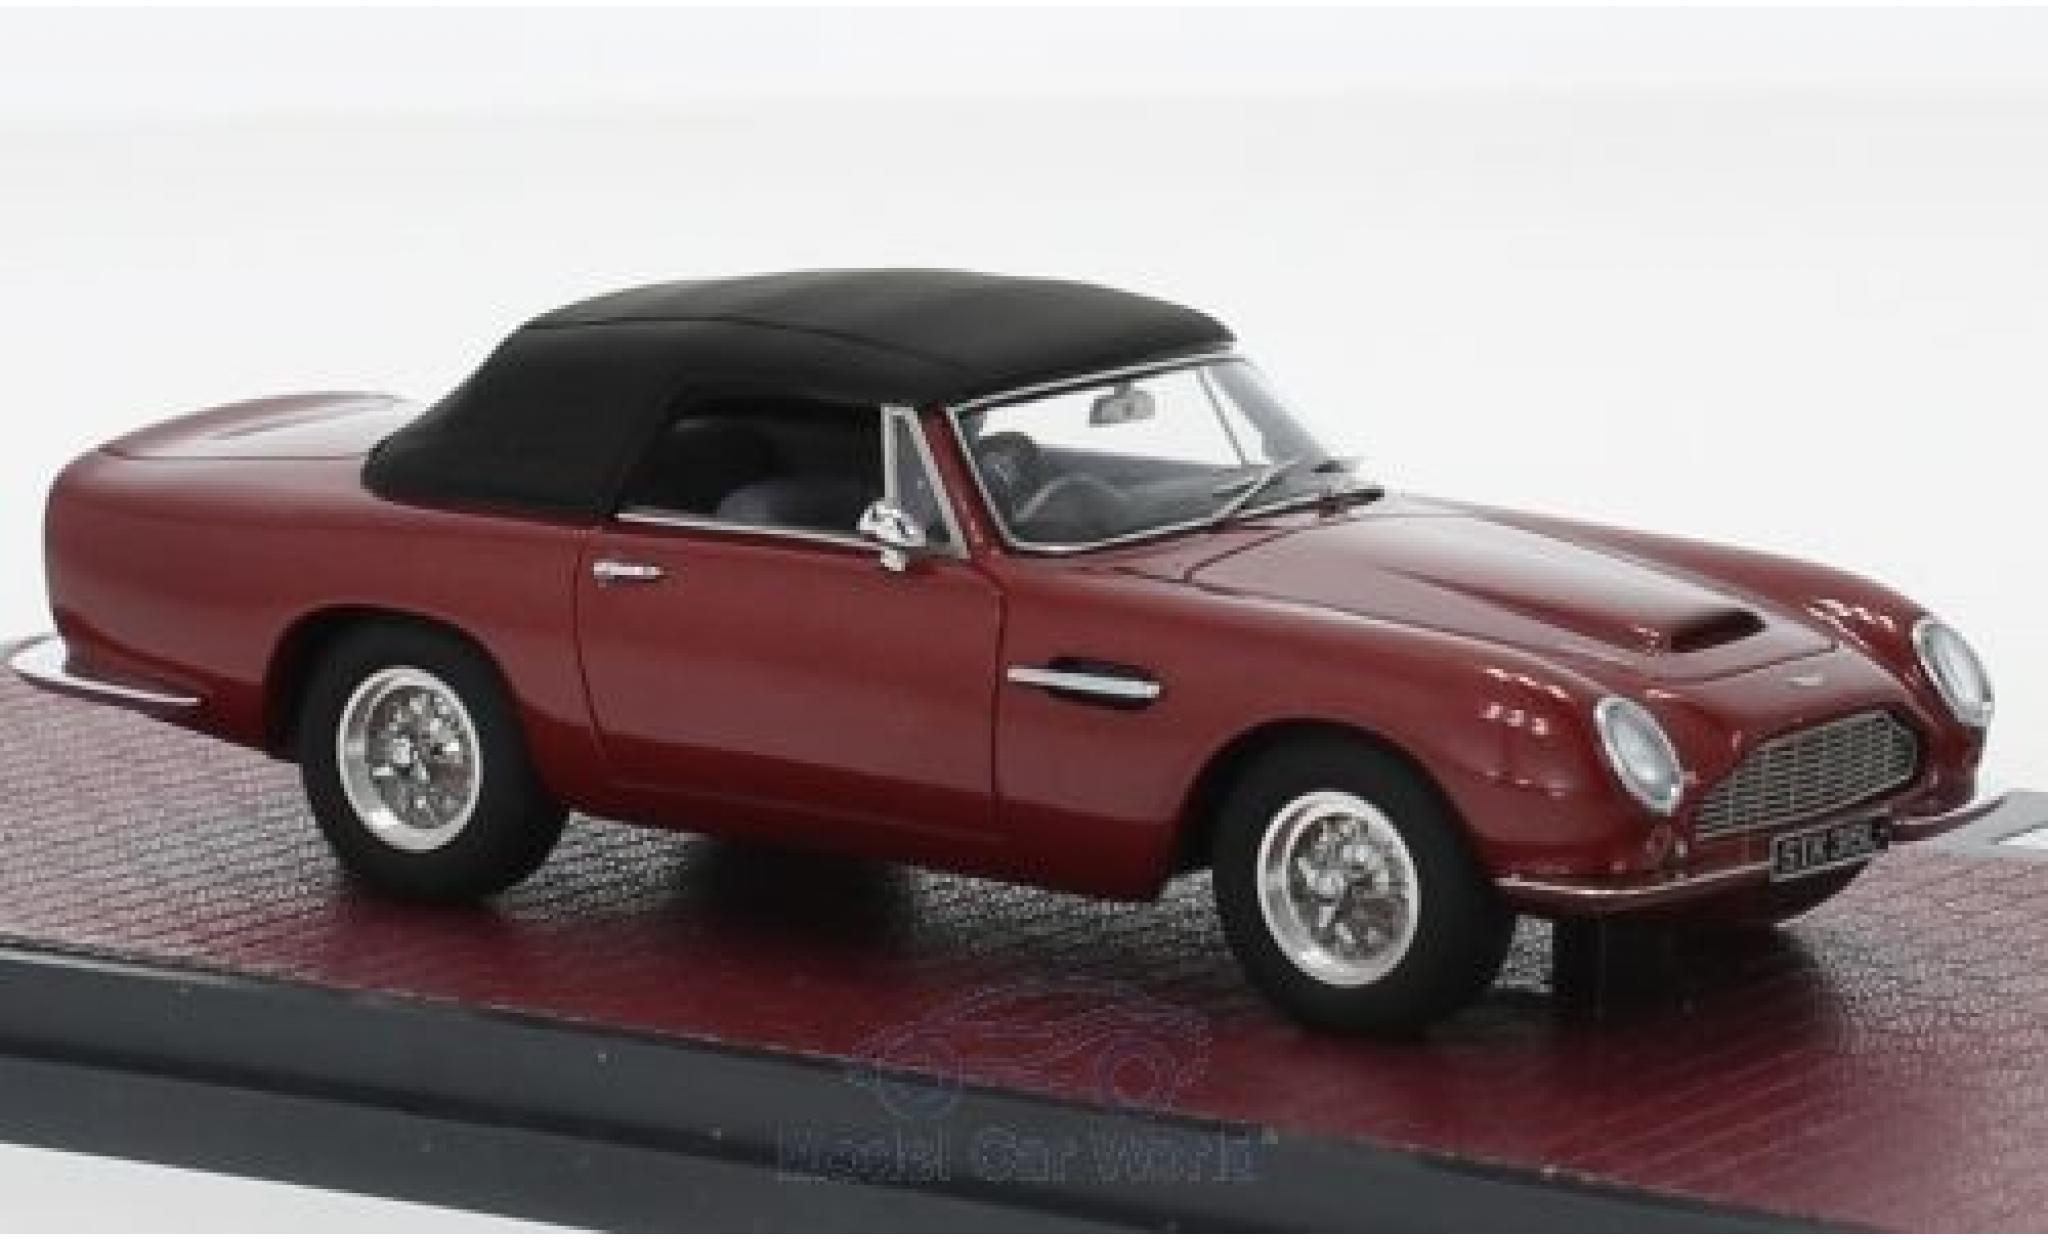 Diecast Model Cars Aston Martin Db6 1 43 Matrix Volante Metallise Red Rhd 1968 Alldiecast Us